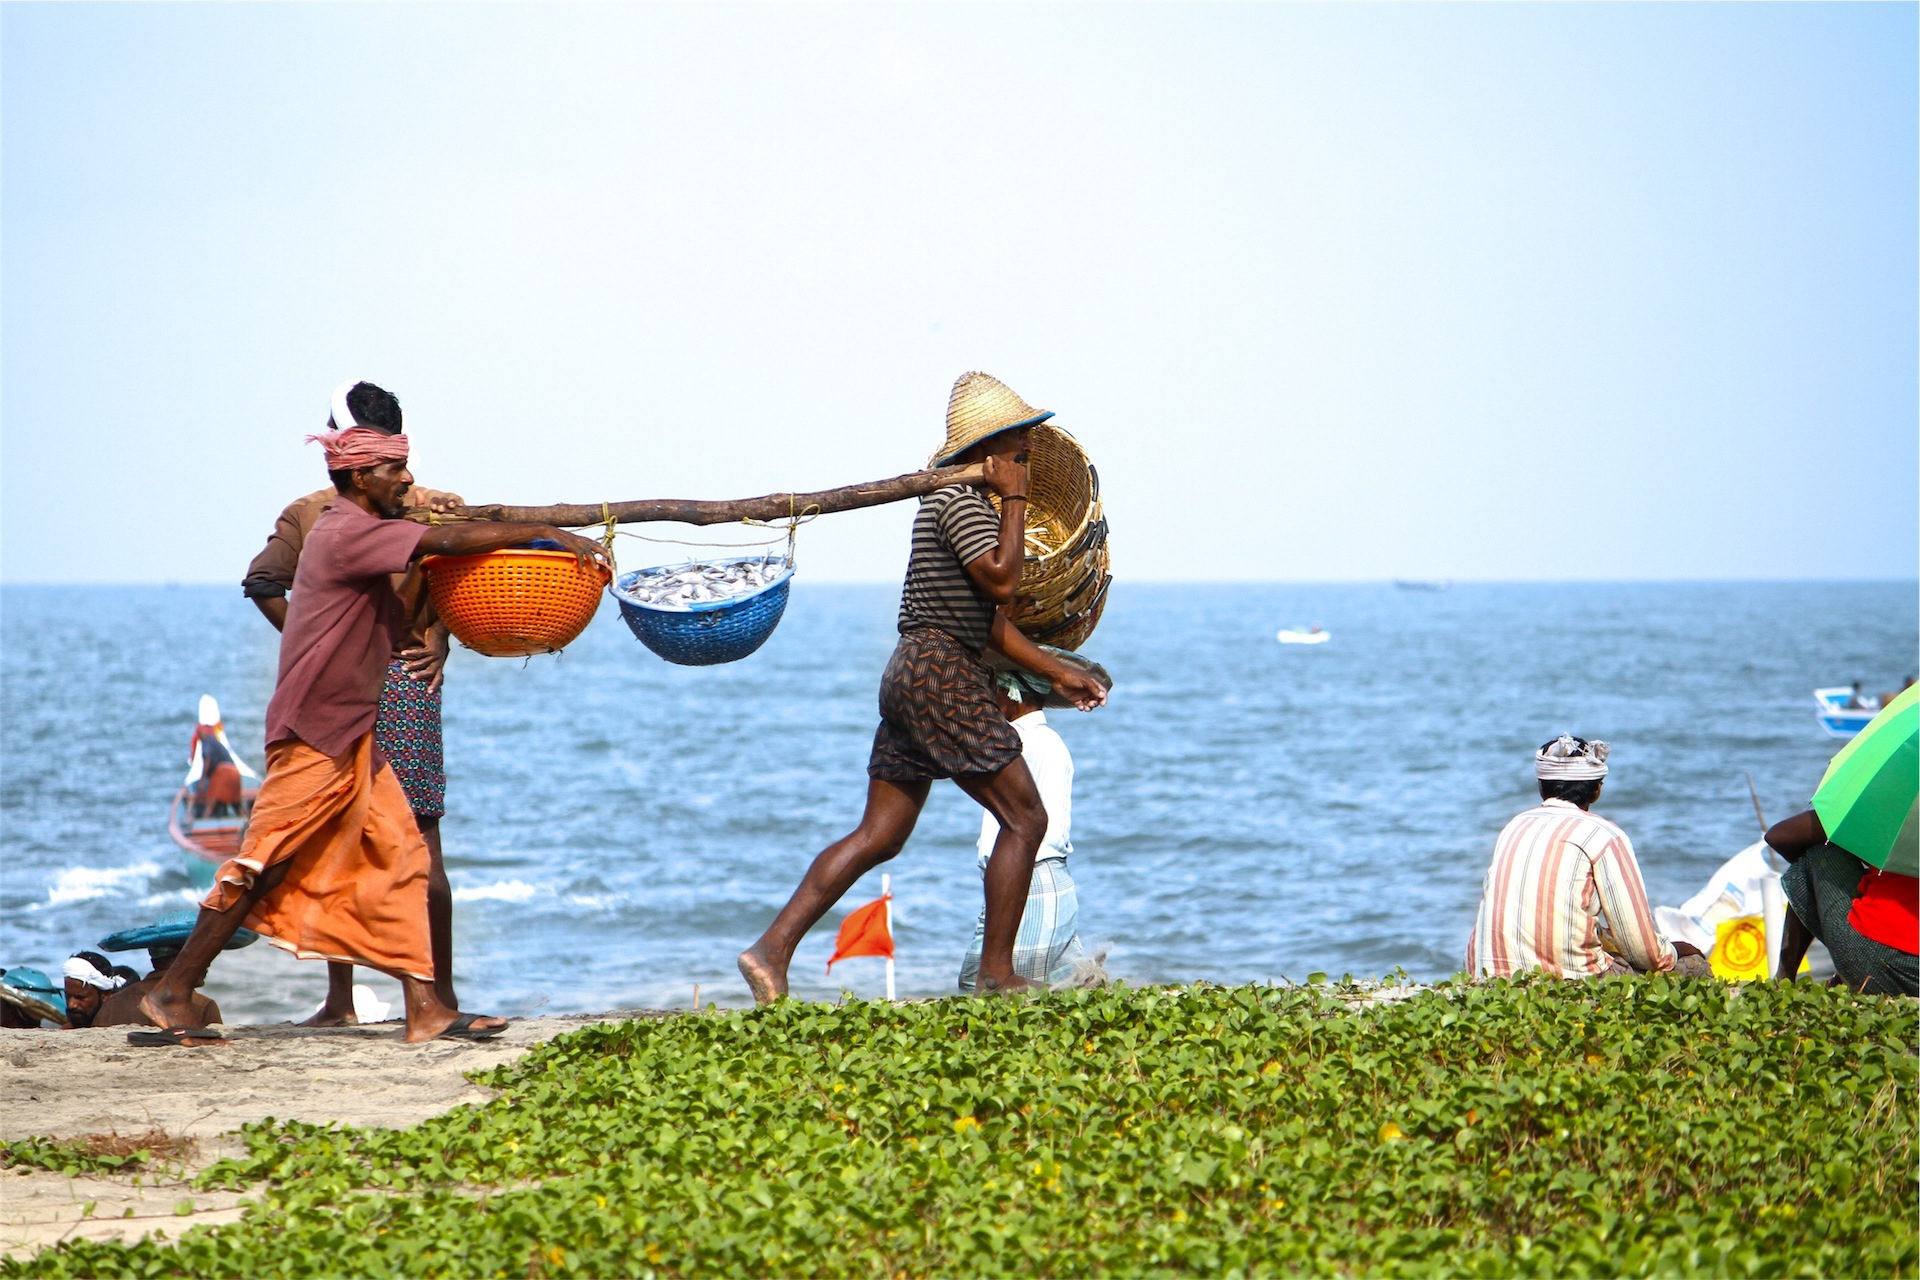 मछुआरों, काम, सागर, मछली, जीवन - HD वॉलपेपर - प्रोफेसर-falken.com